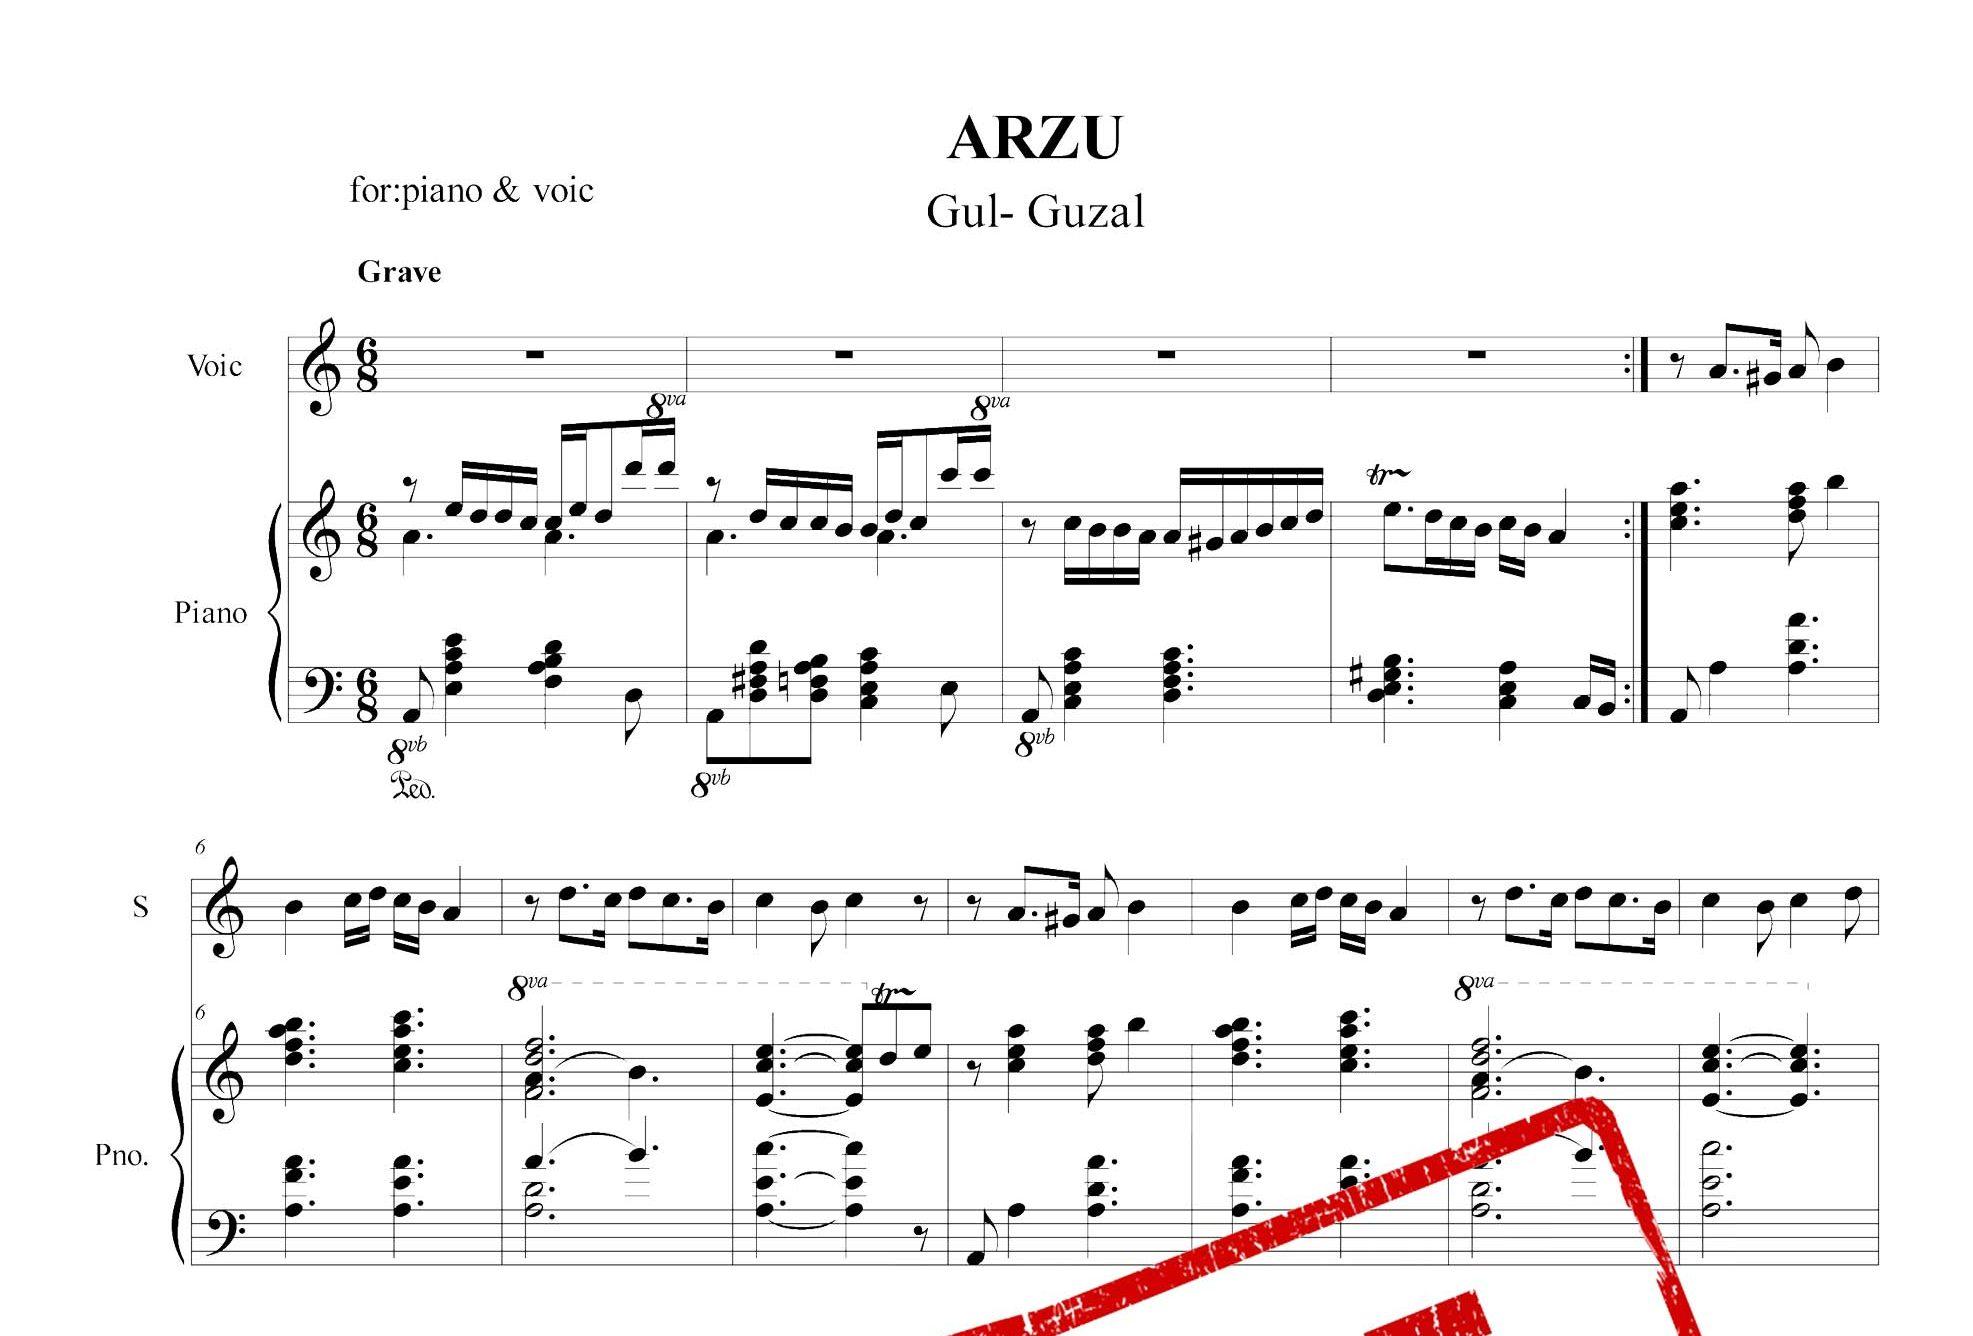 نت پیانوی آرزو گول گوزل به همراه نت کال قطعه